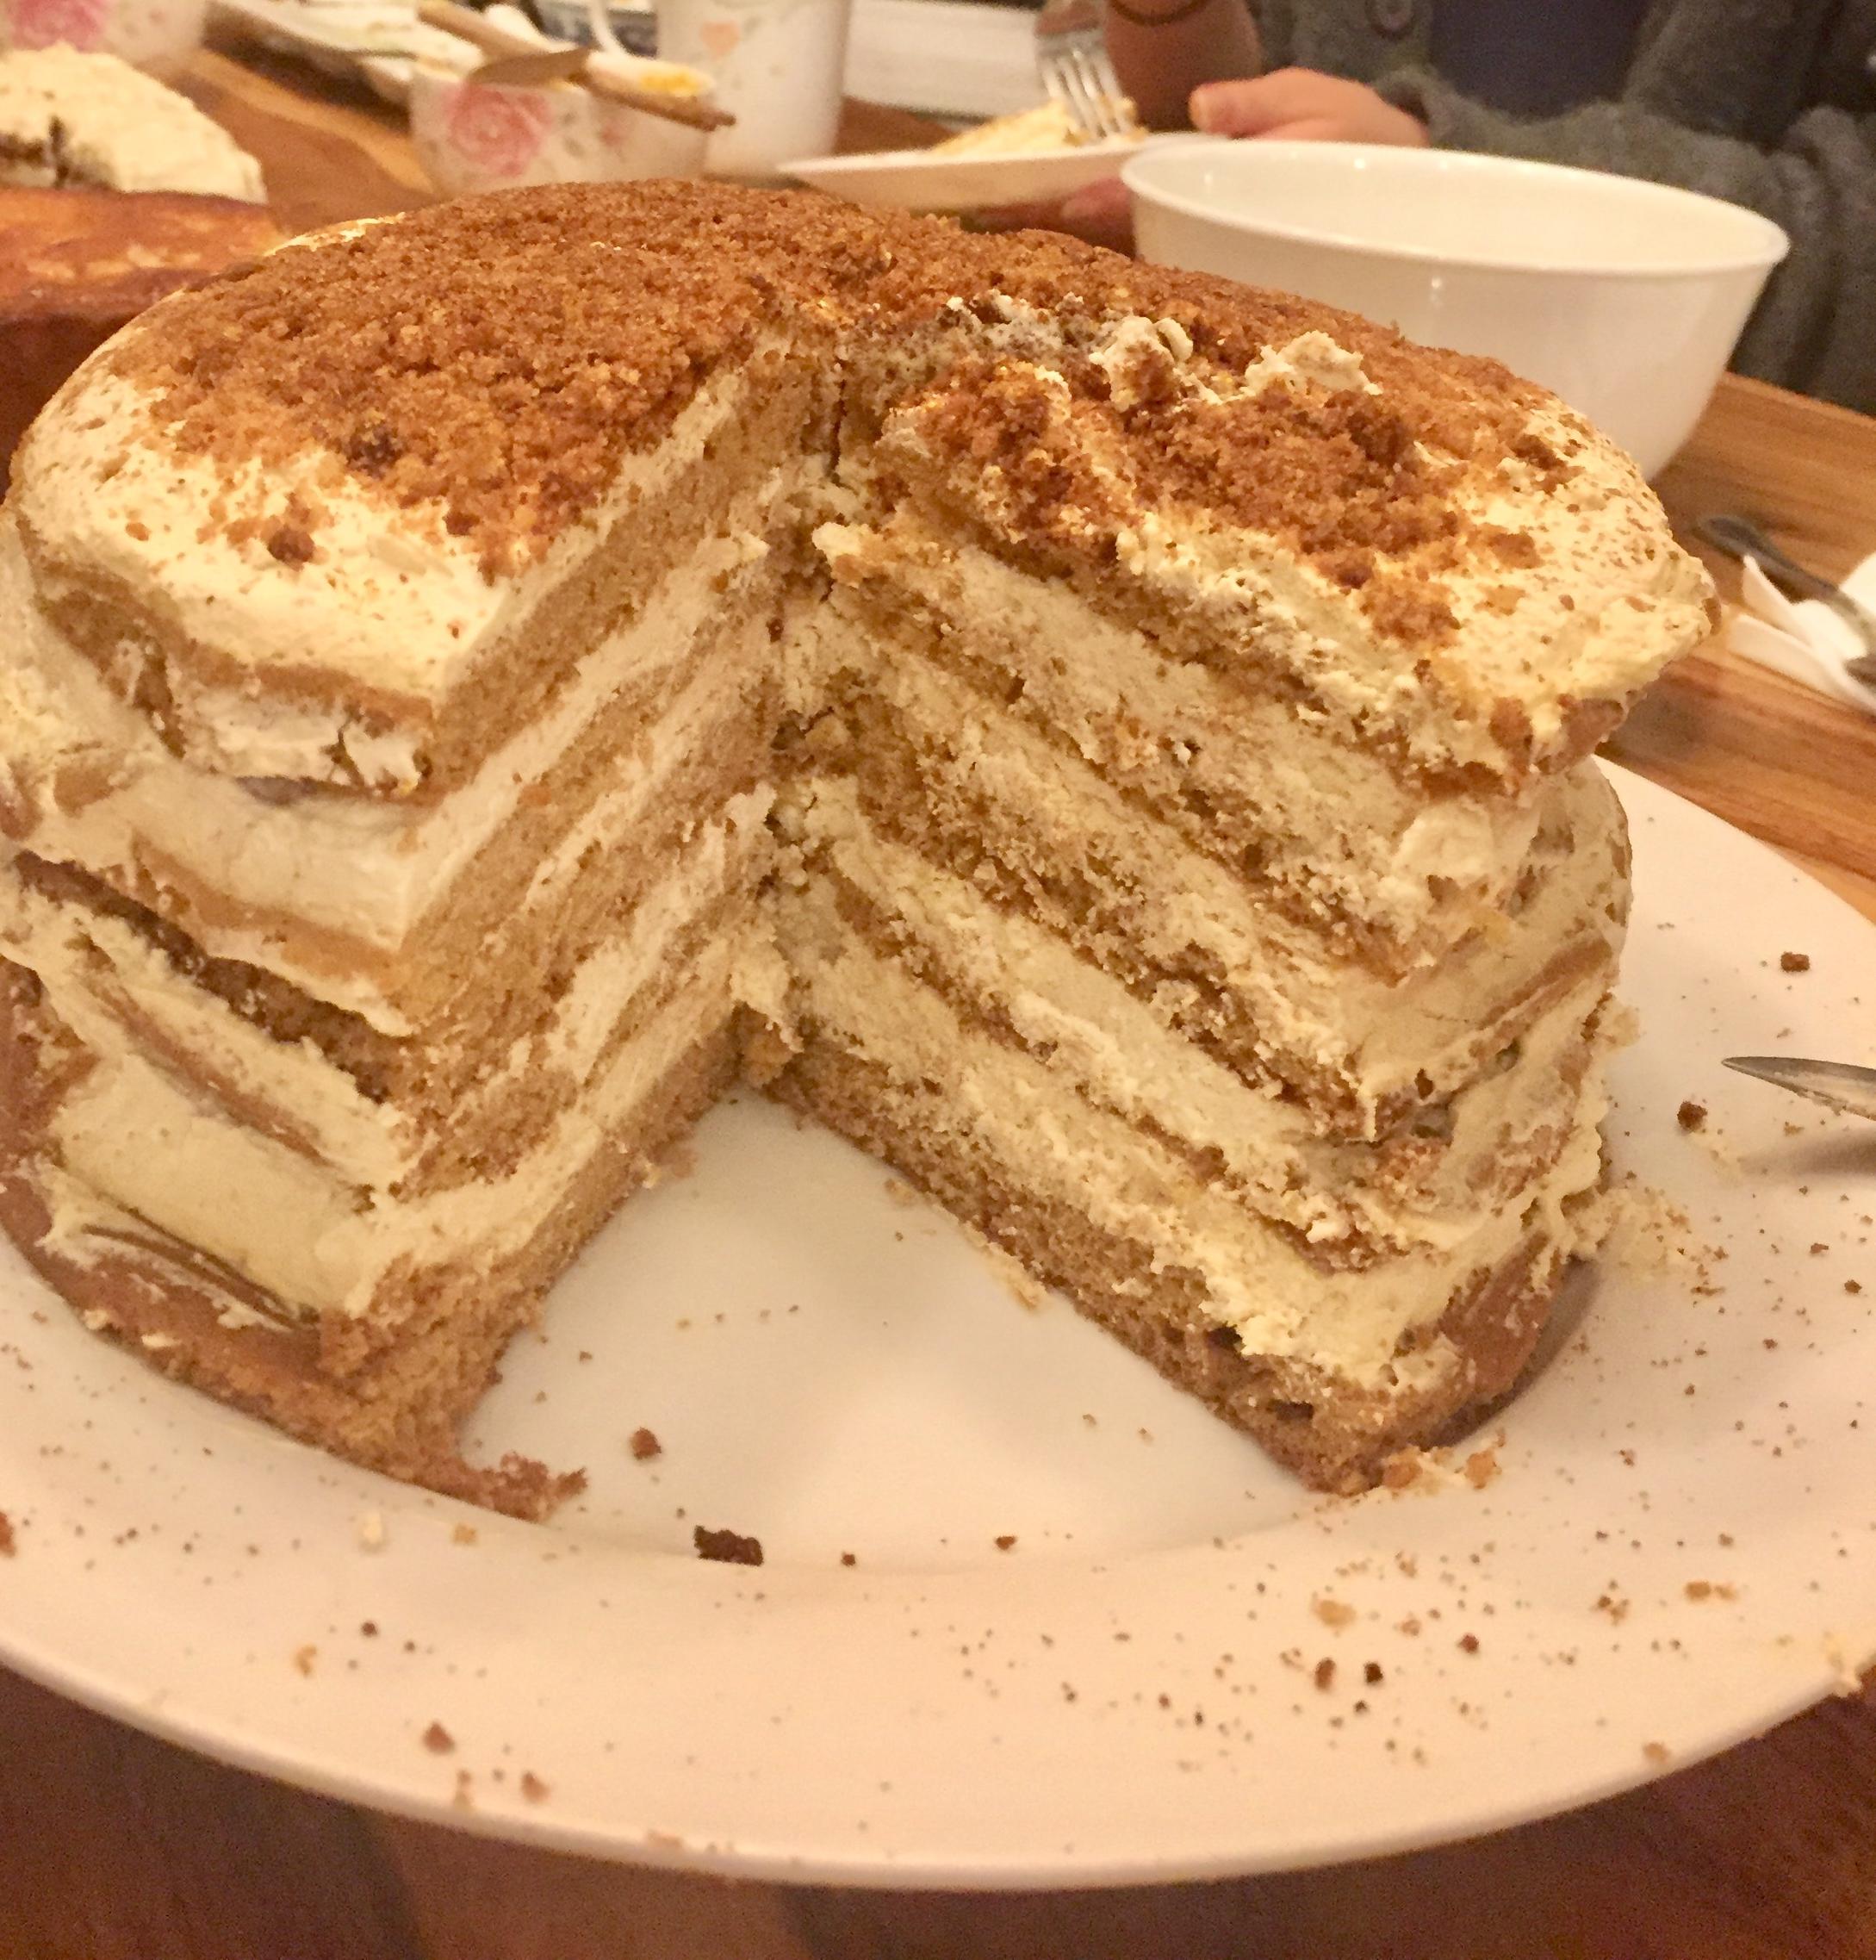 Russian Honey Cake crys